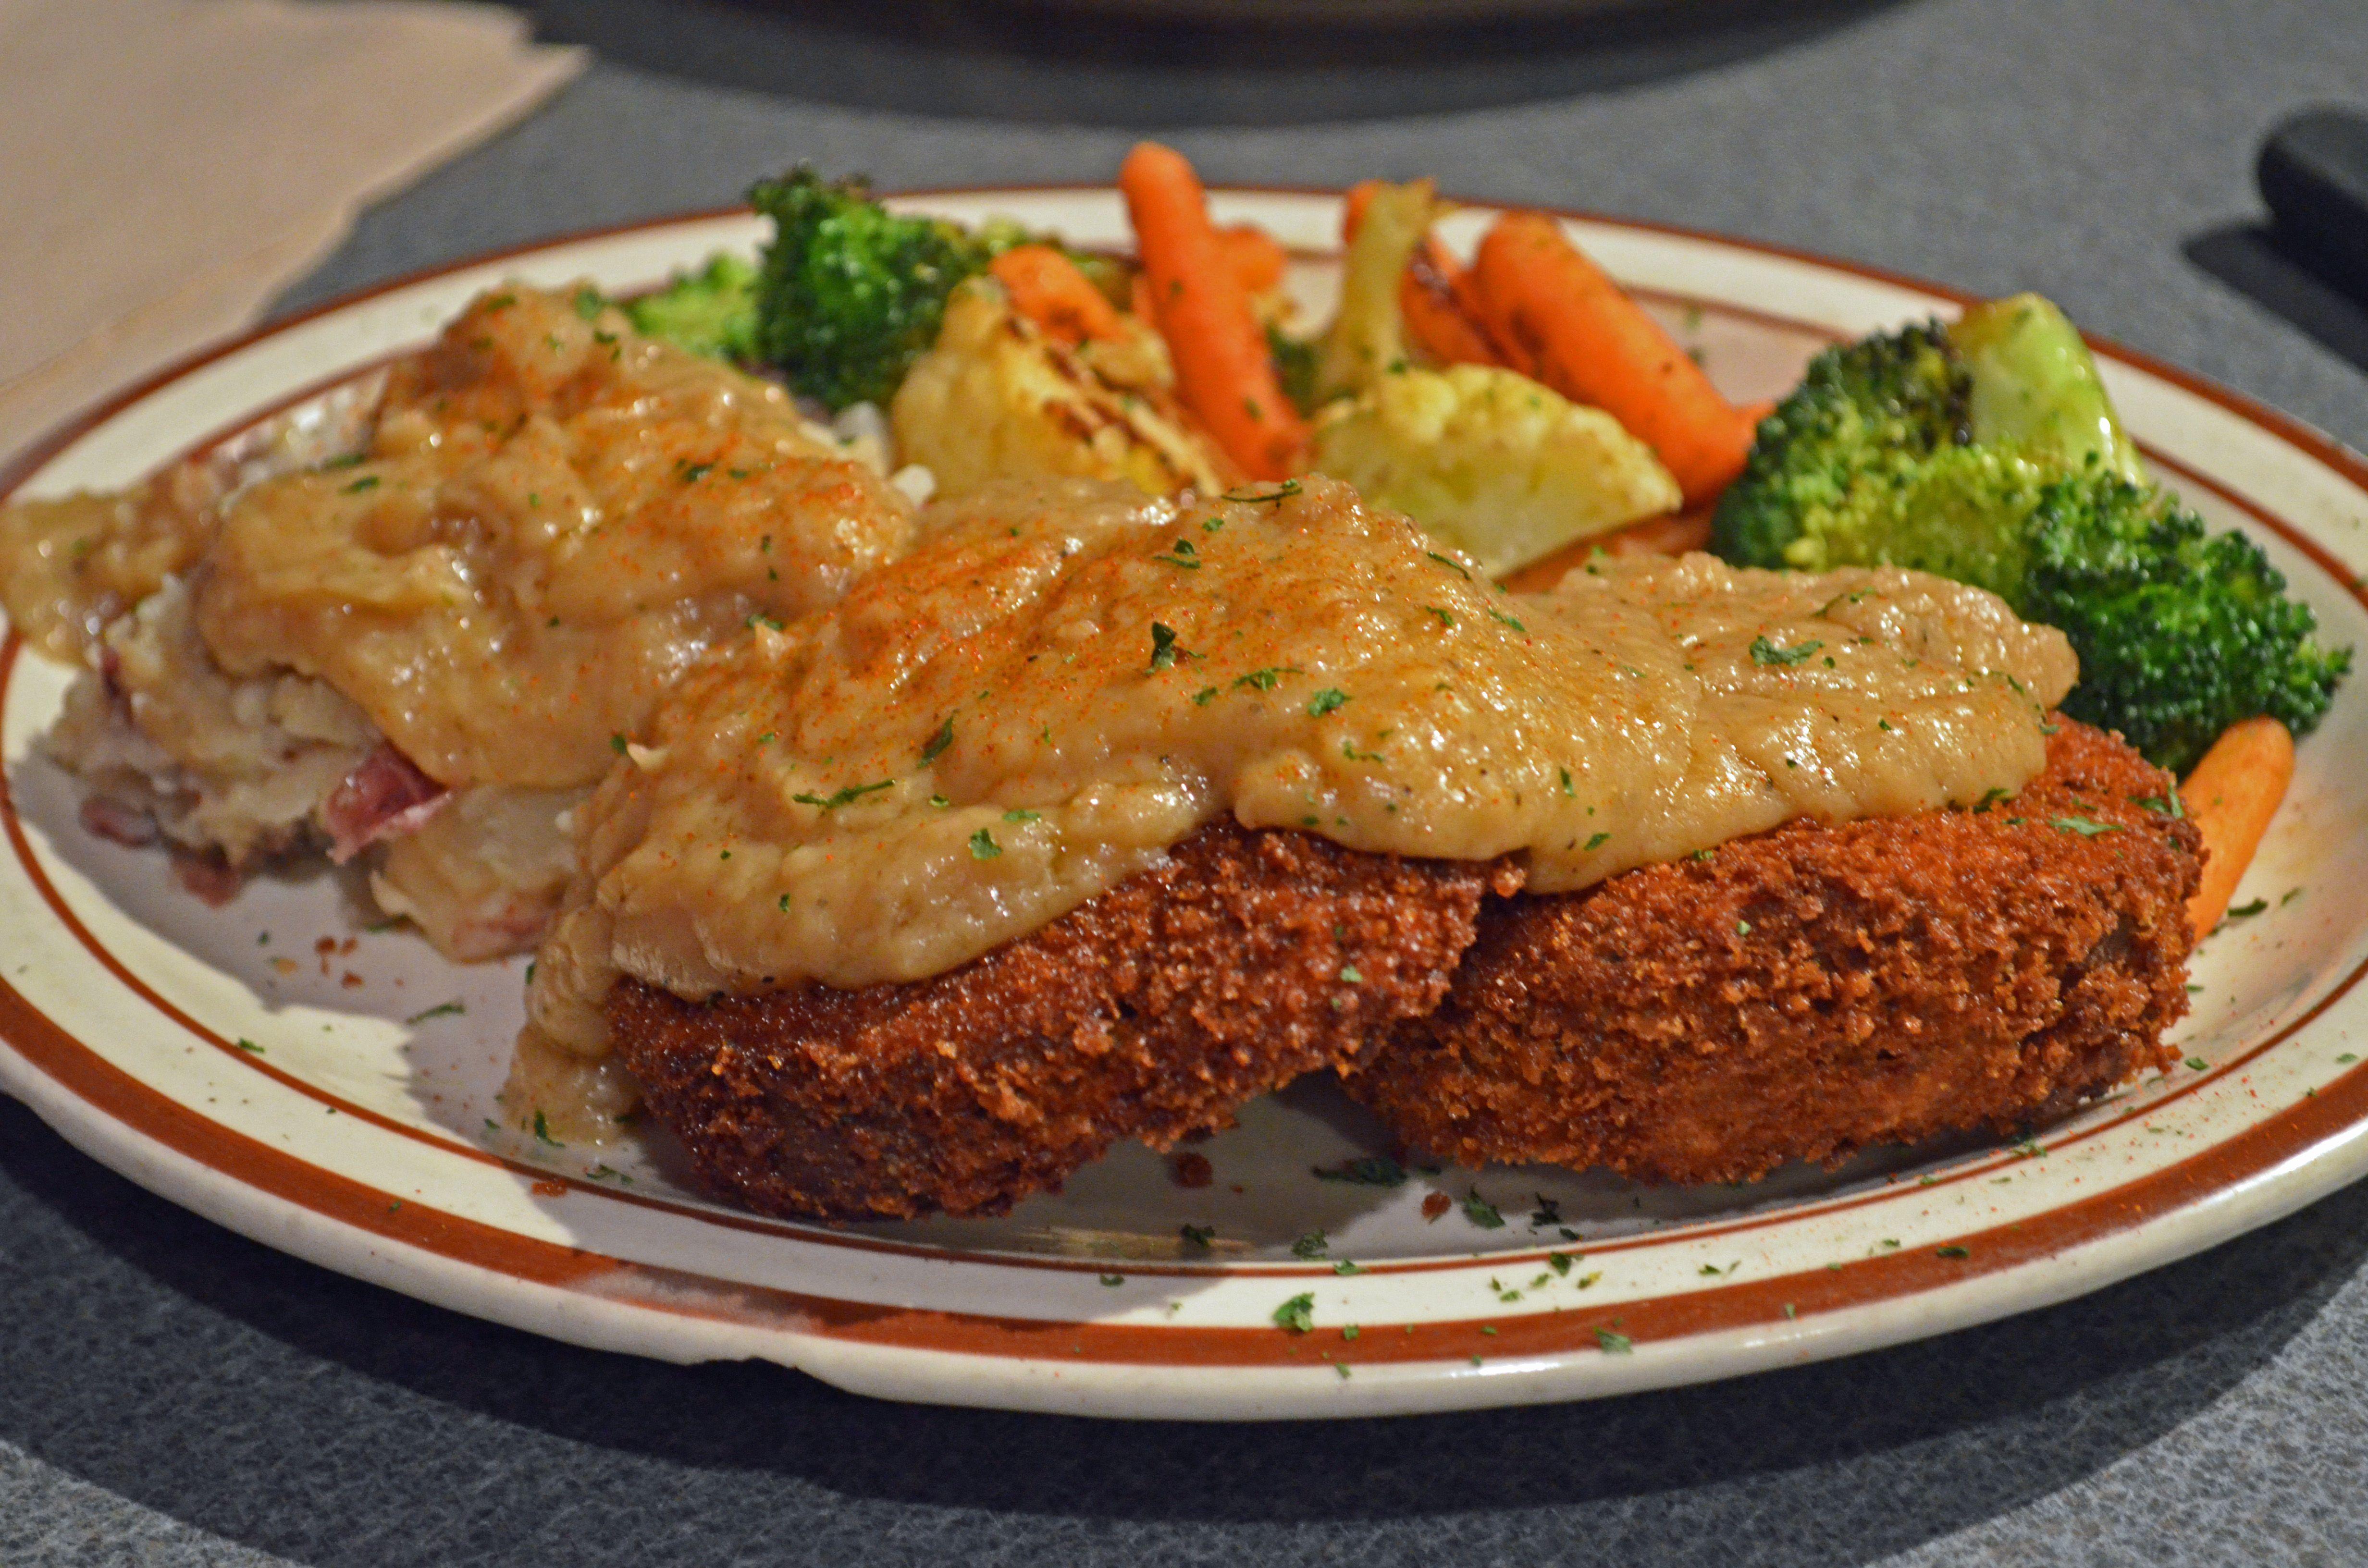 Chicken Fried Steak At Wayward Vegan Cafe In Seattle Vegan Cafe Seafood Restaurant Food